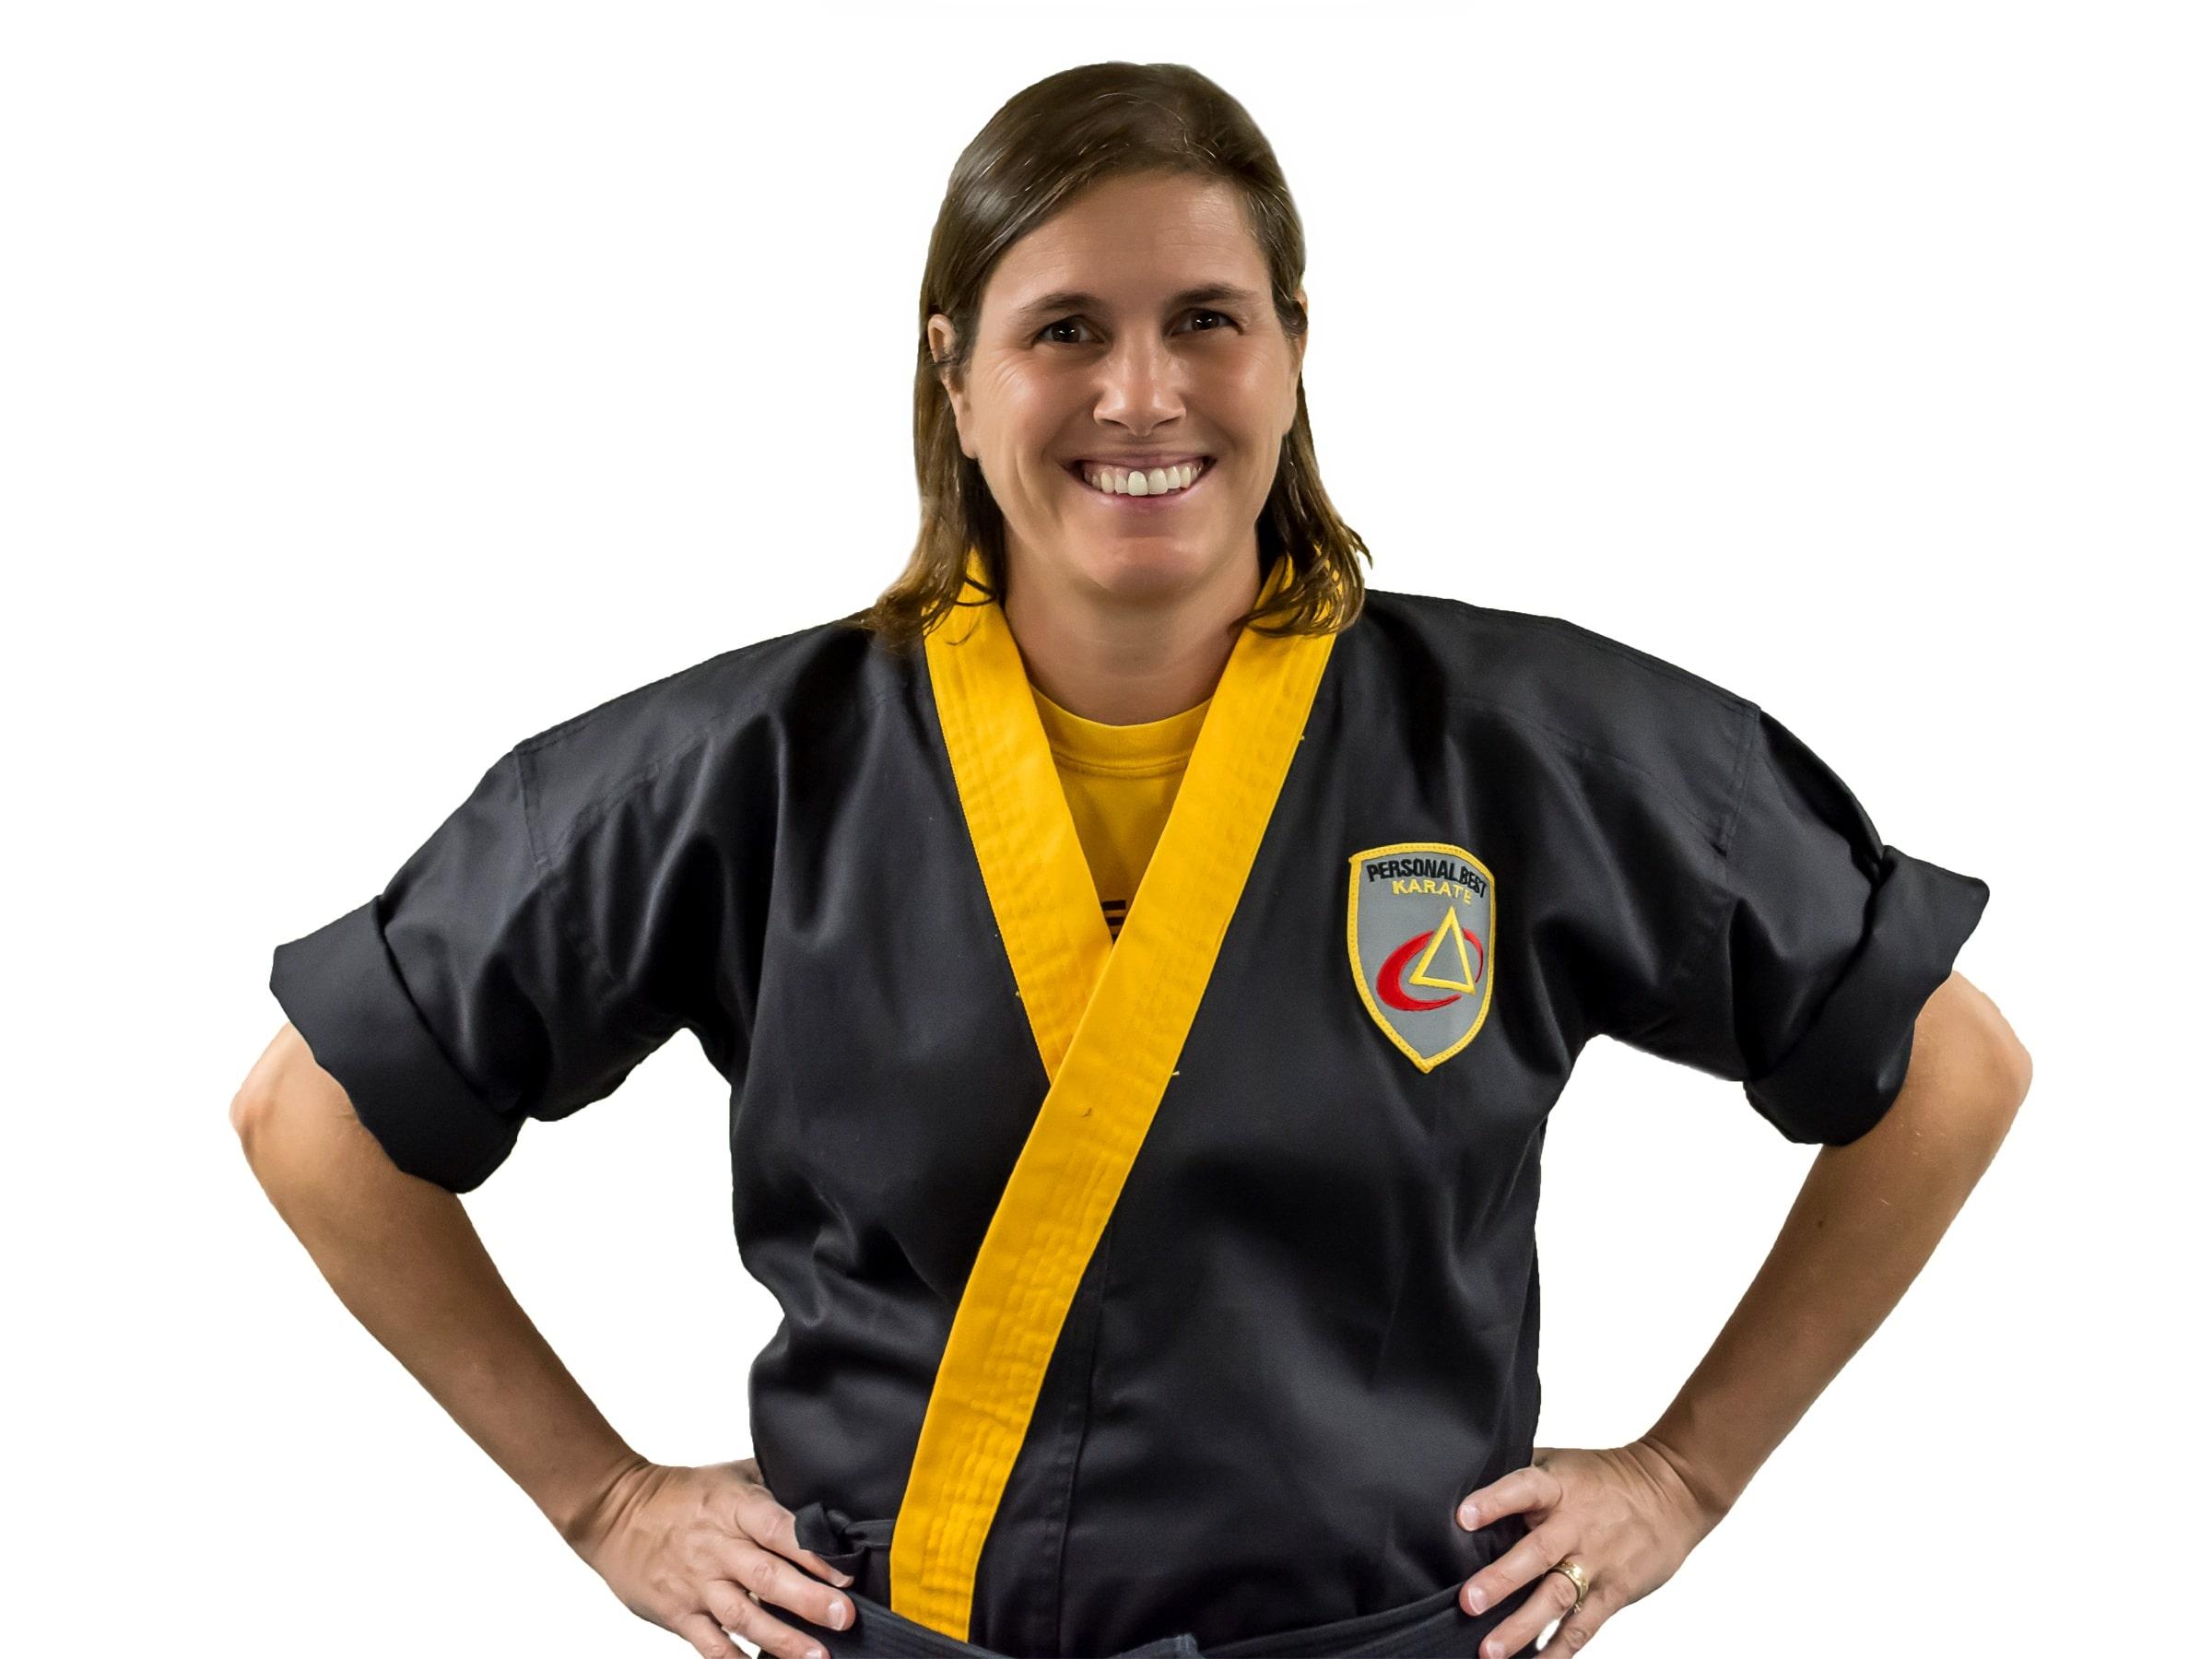 Barbara Mosca in Norton - Personal Best Karate